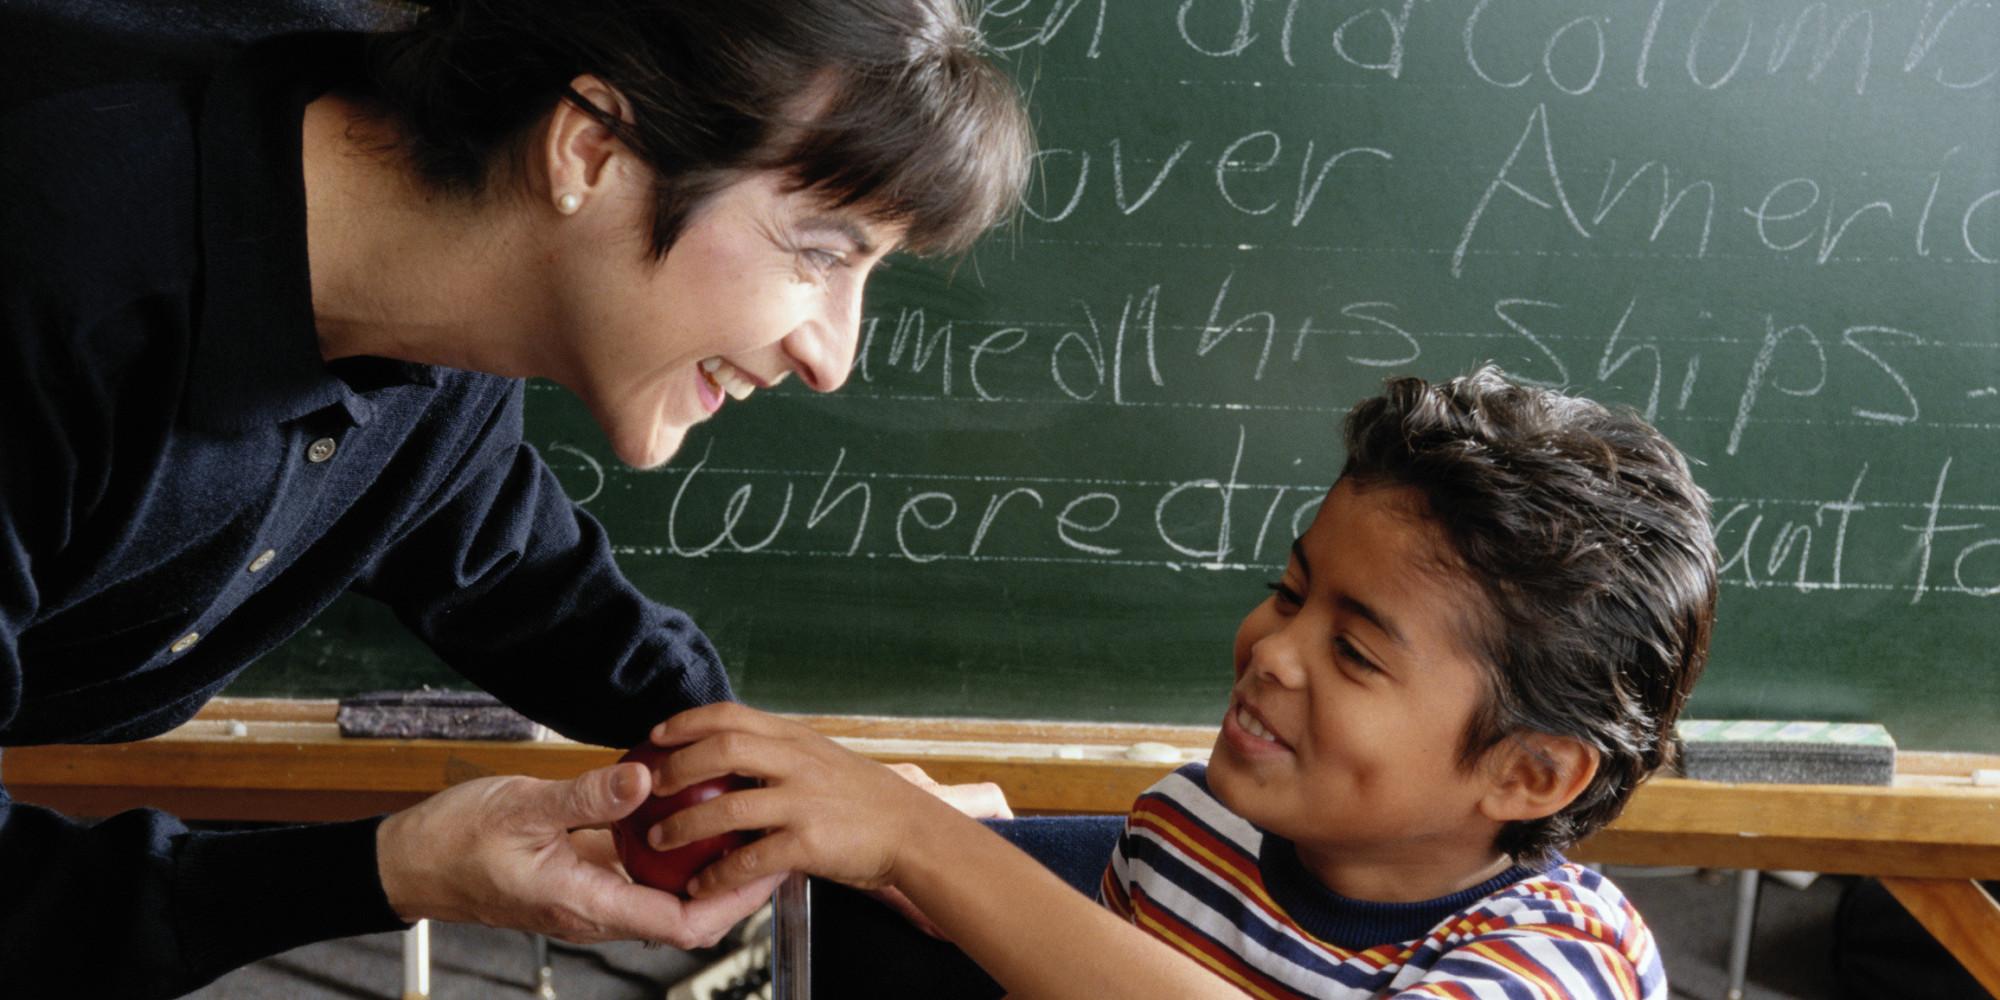 essay about qualities of a good teacher